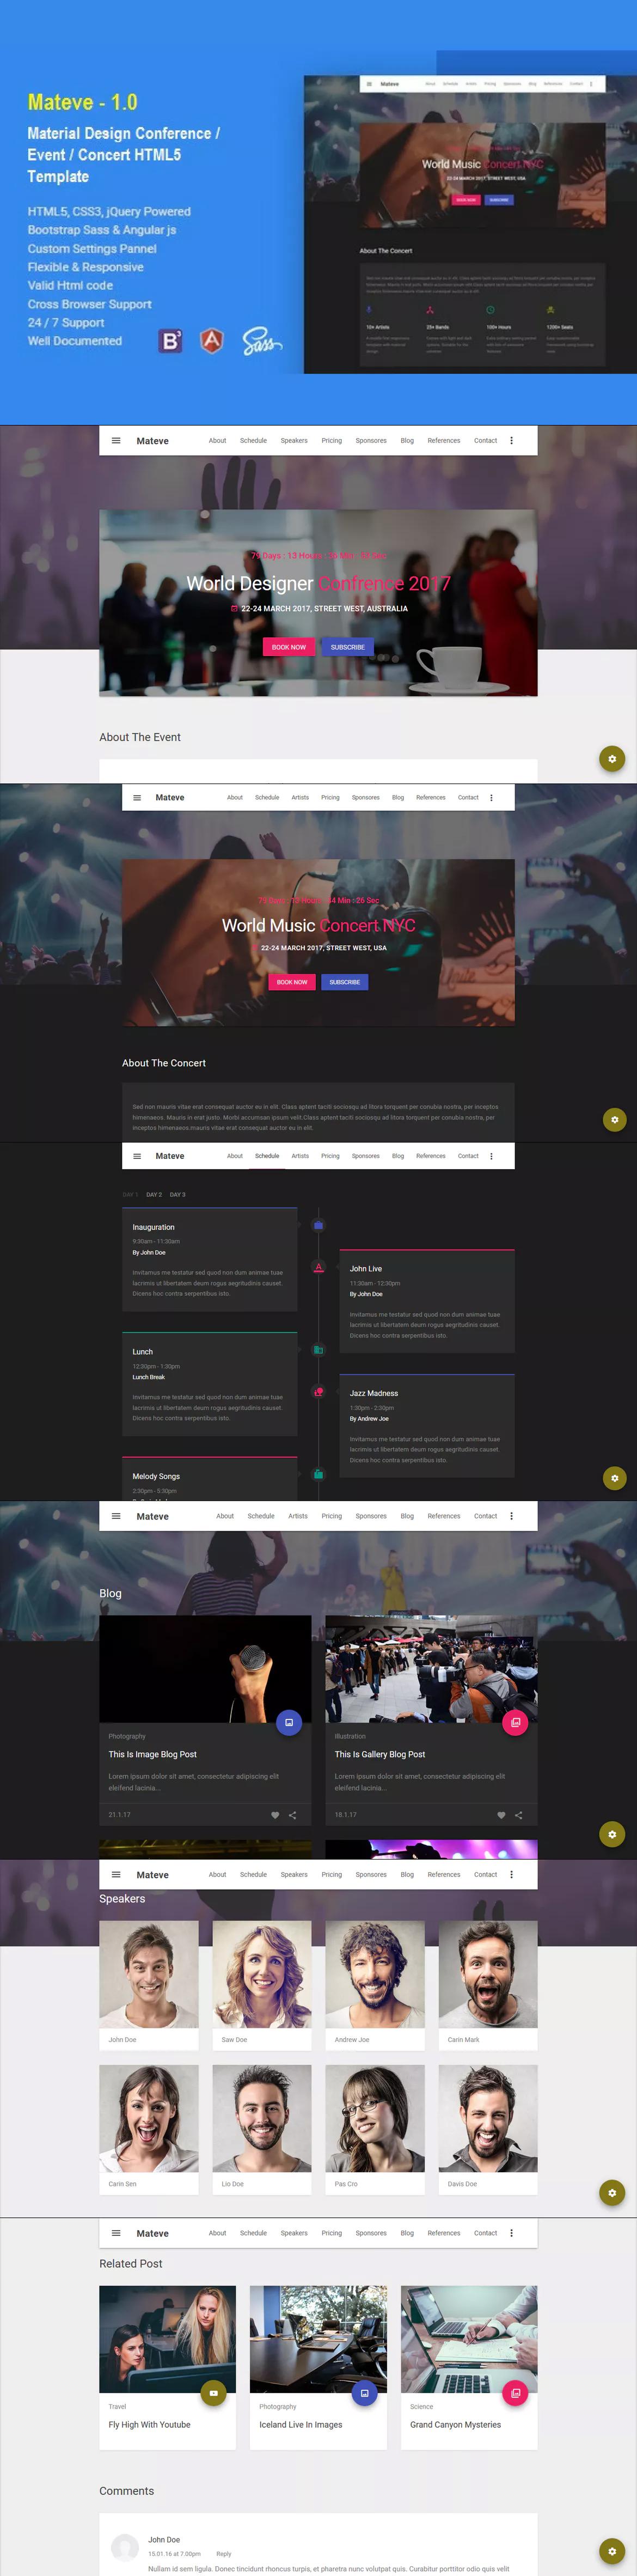 Mateve Event / Conference / Concert HTML Template   HTML Website ...